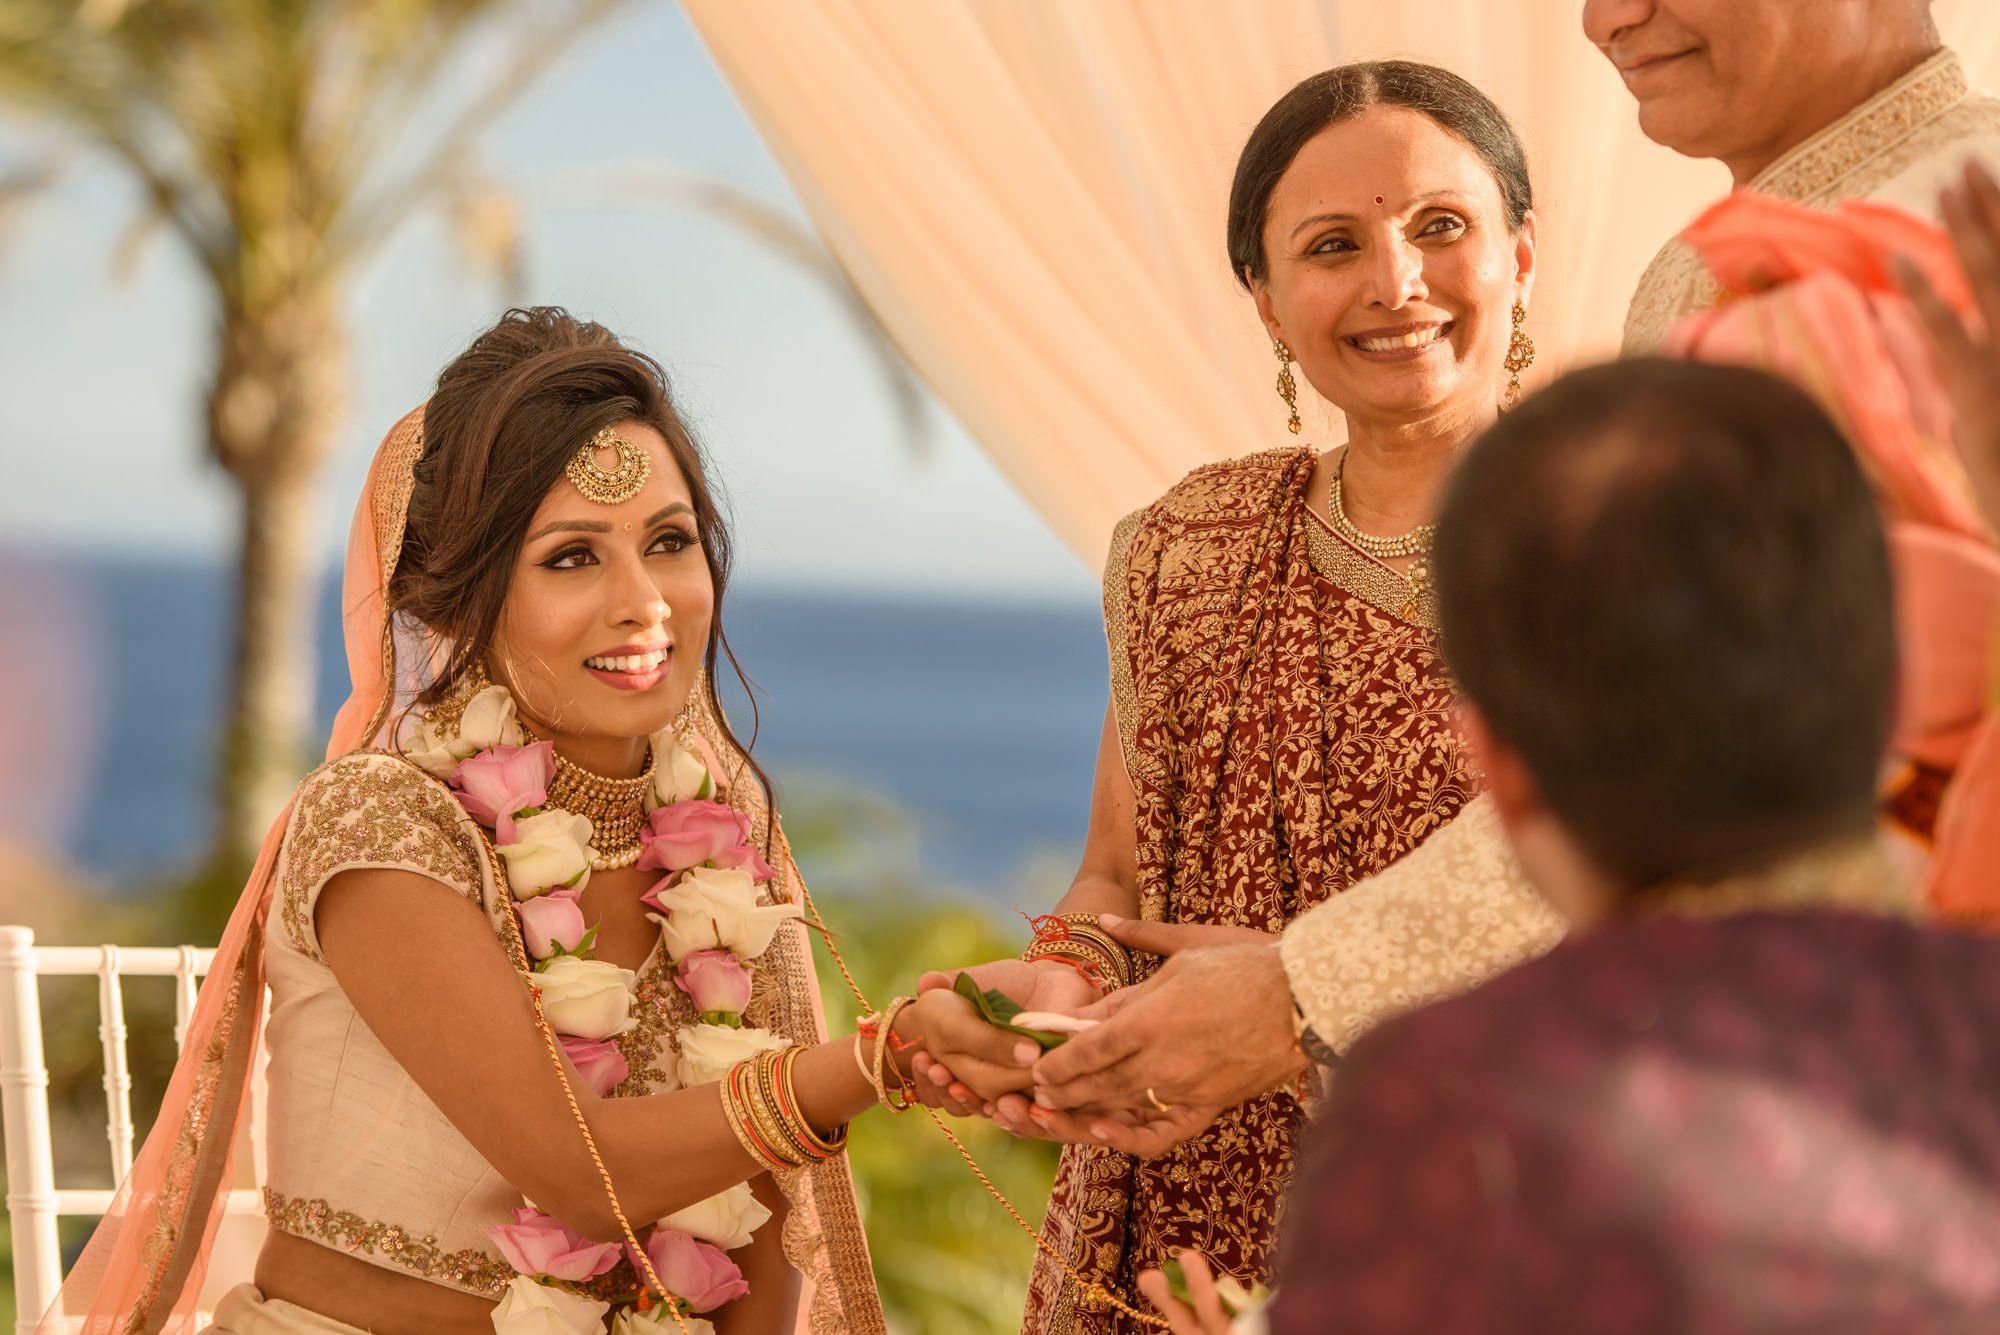 satnam photography wedding indian asian hindu destination wedding photographer tenerife ritz carlton abama-166.jpg